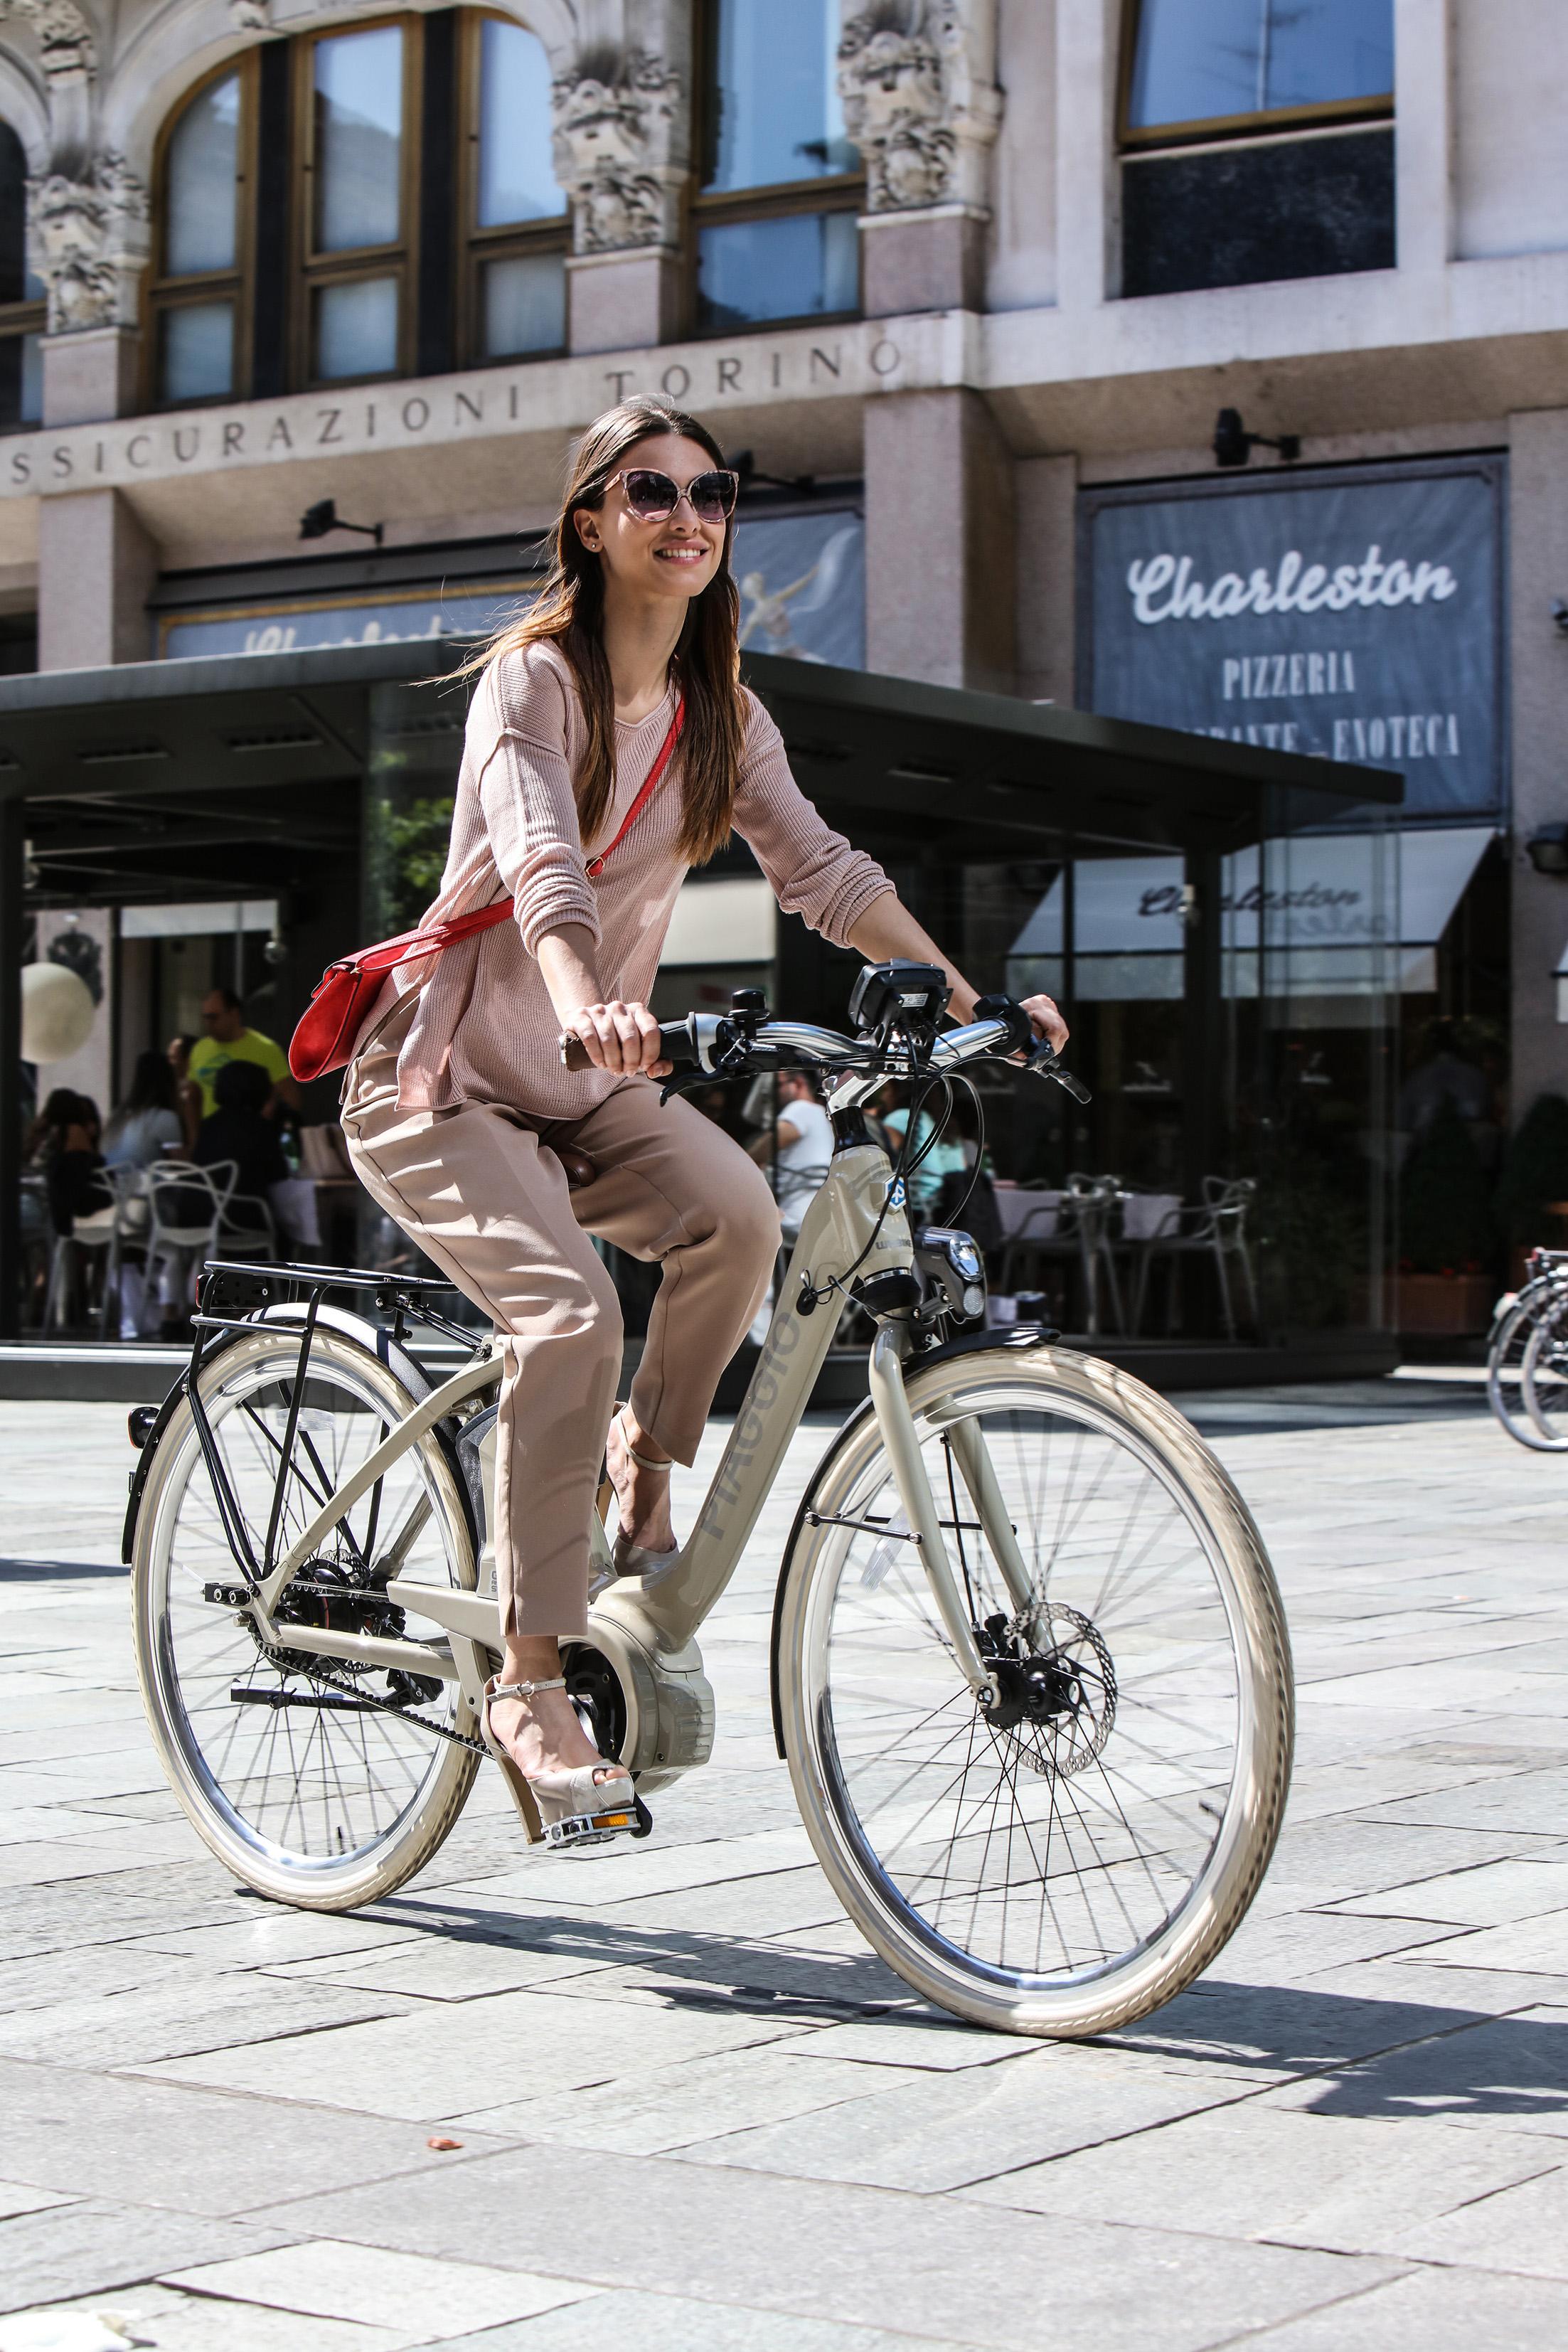 89 Wi-Bike.jpg